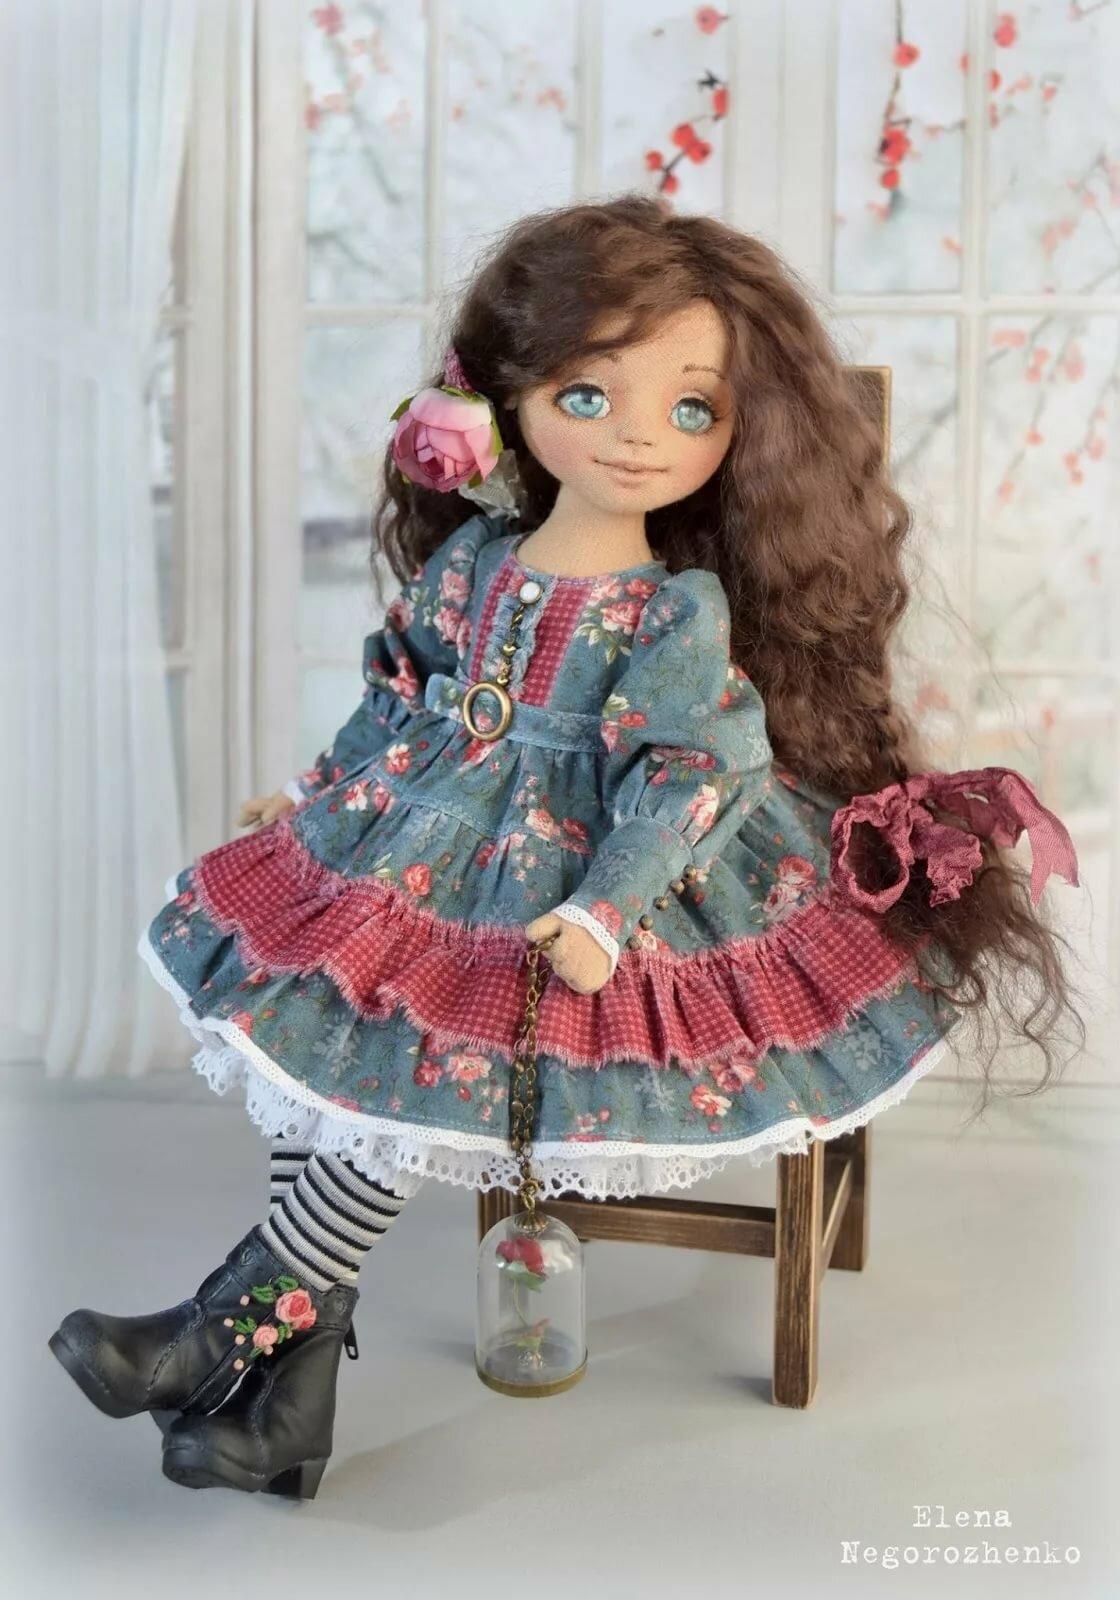 этот ливинтернет куклы картинки красновато-прозрачный окрас